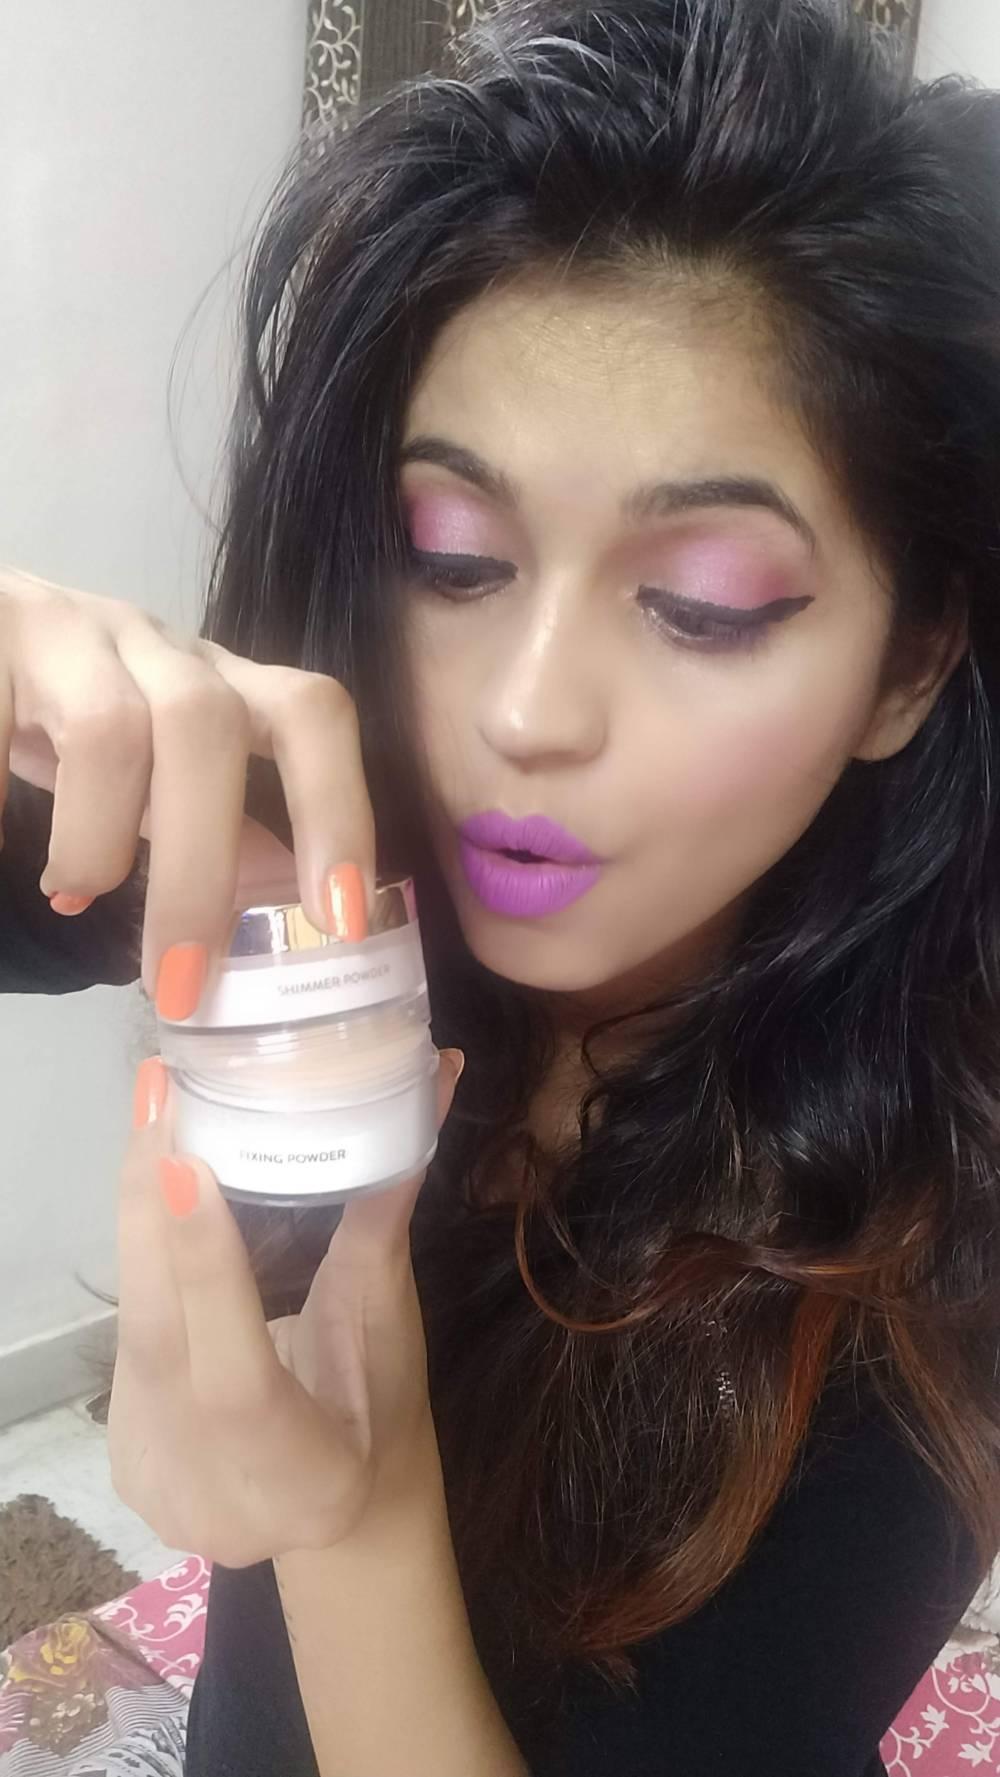 MyGlamm Glow to Glamour Shimmer Powder & Fixing powder